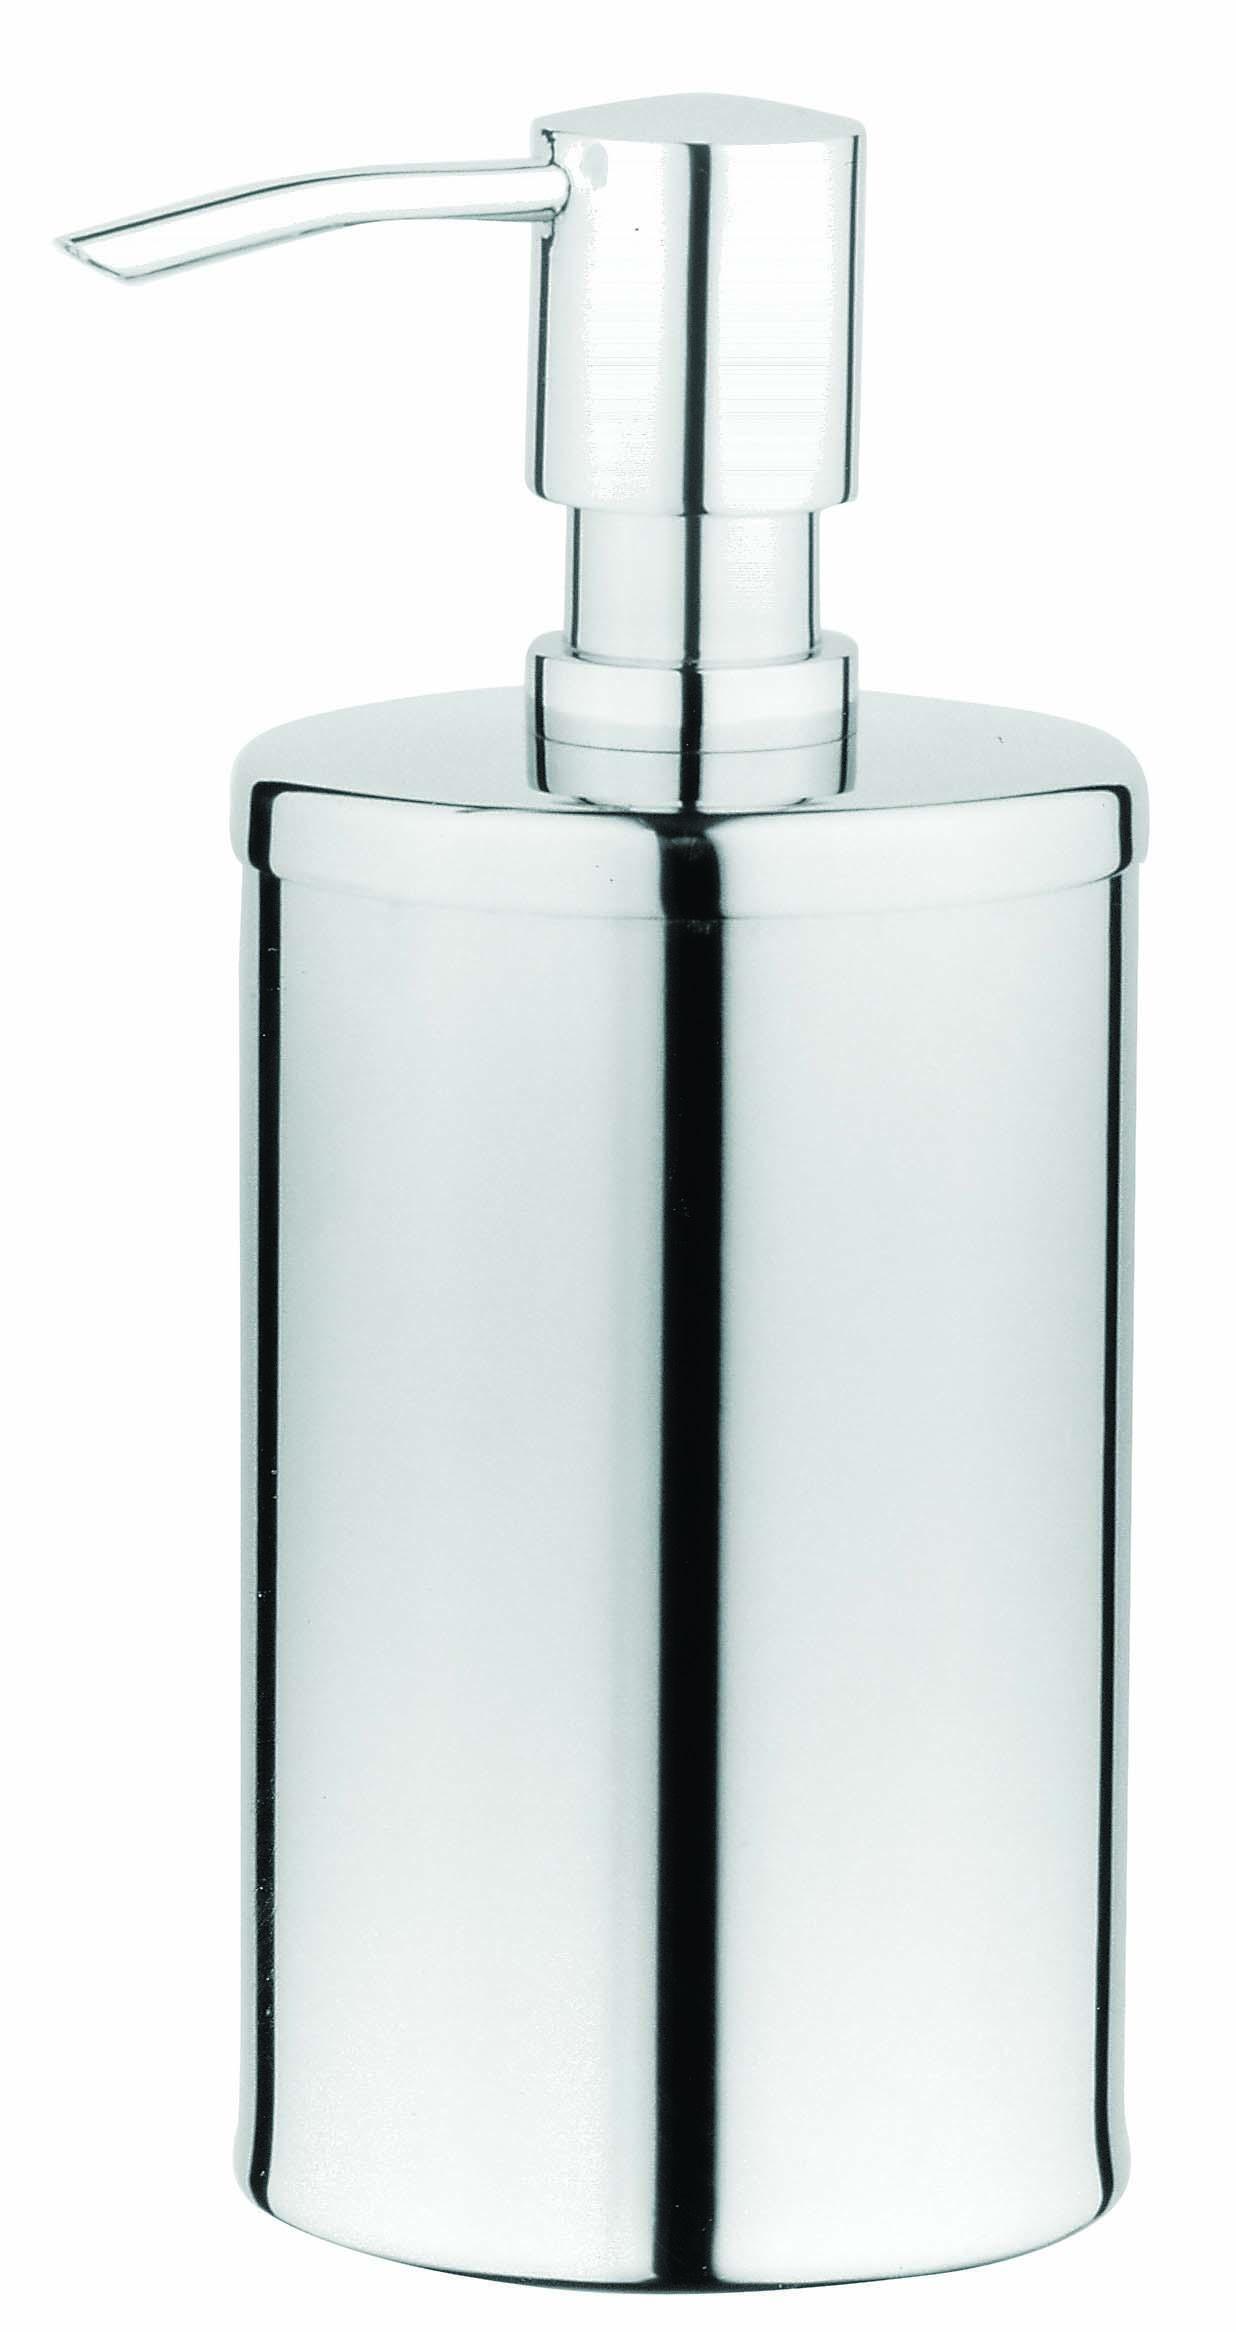 Arkitekta Liquid Soap Dispenser (Counter Top)